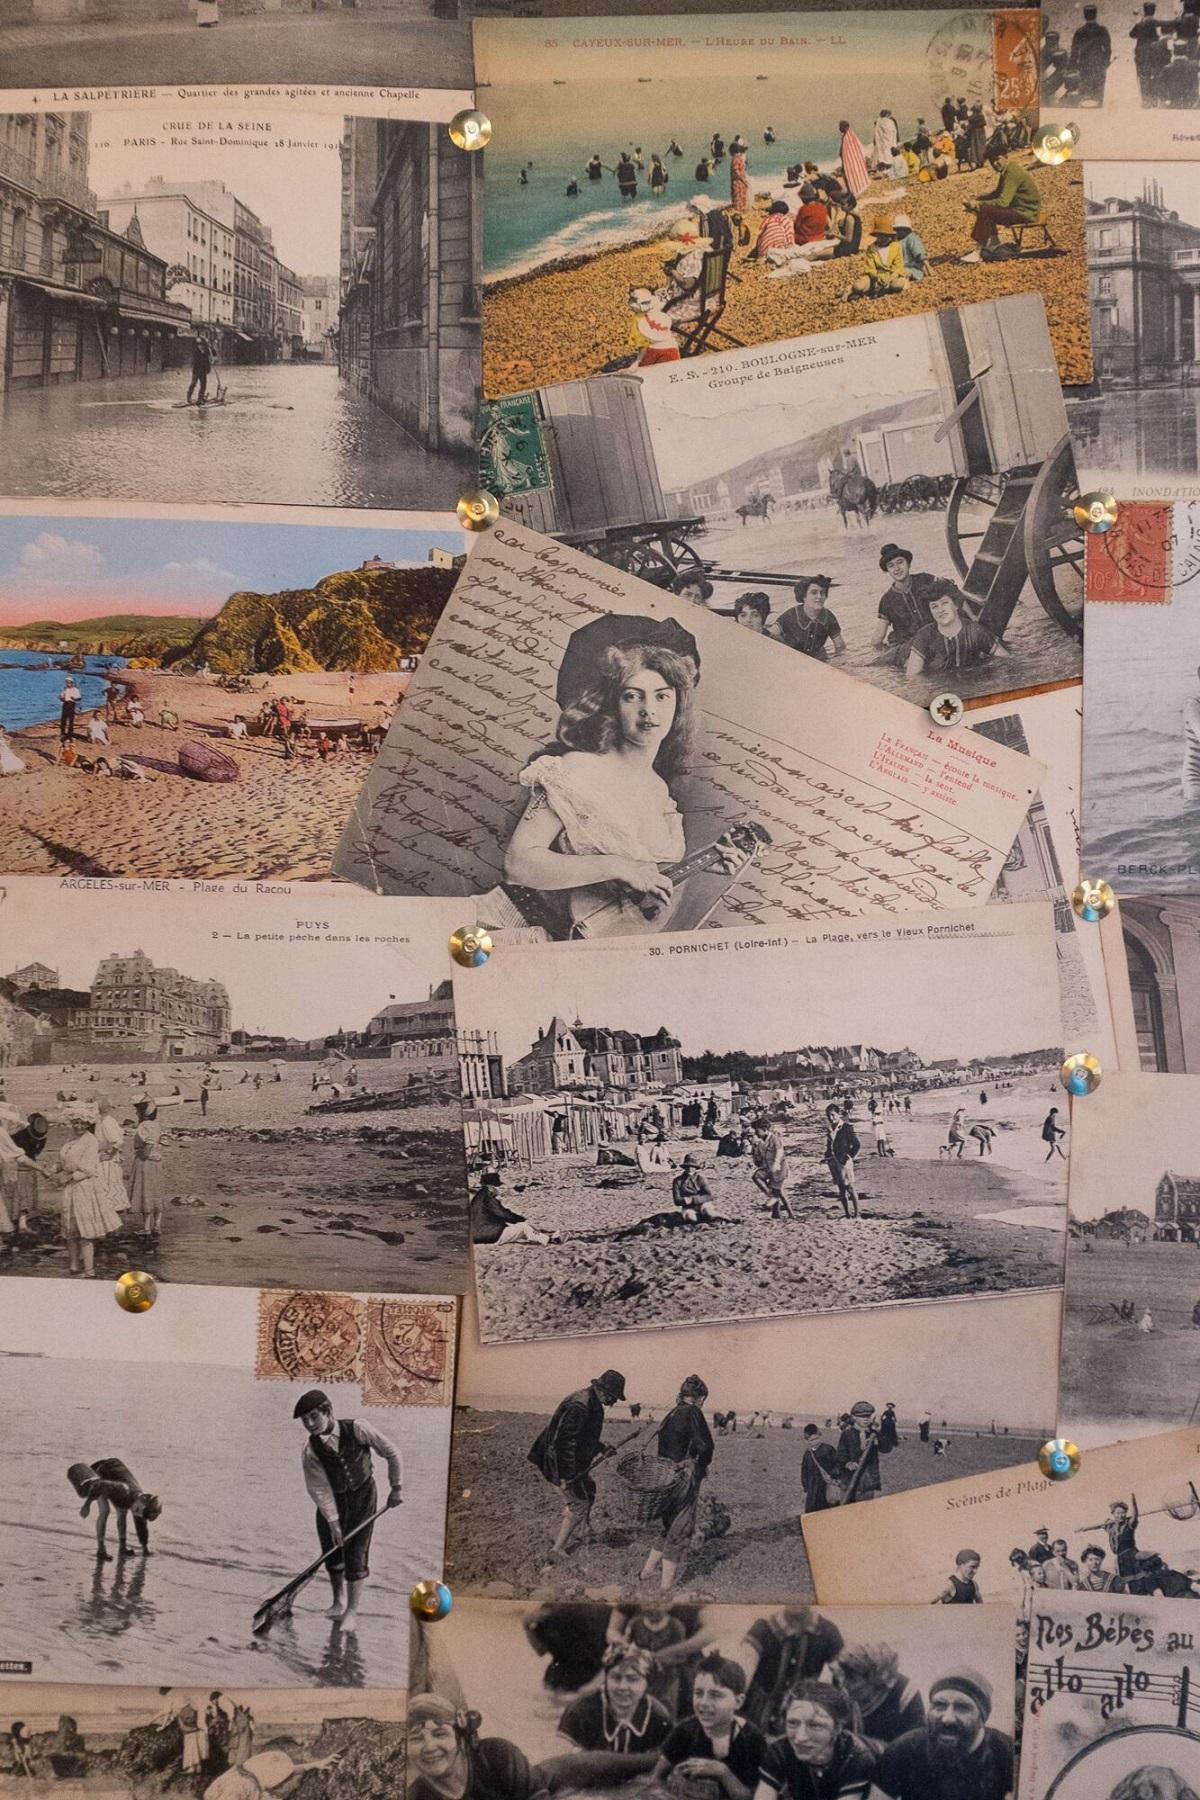 postcards from paris image.jpg